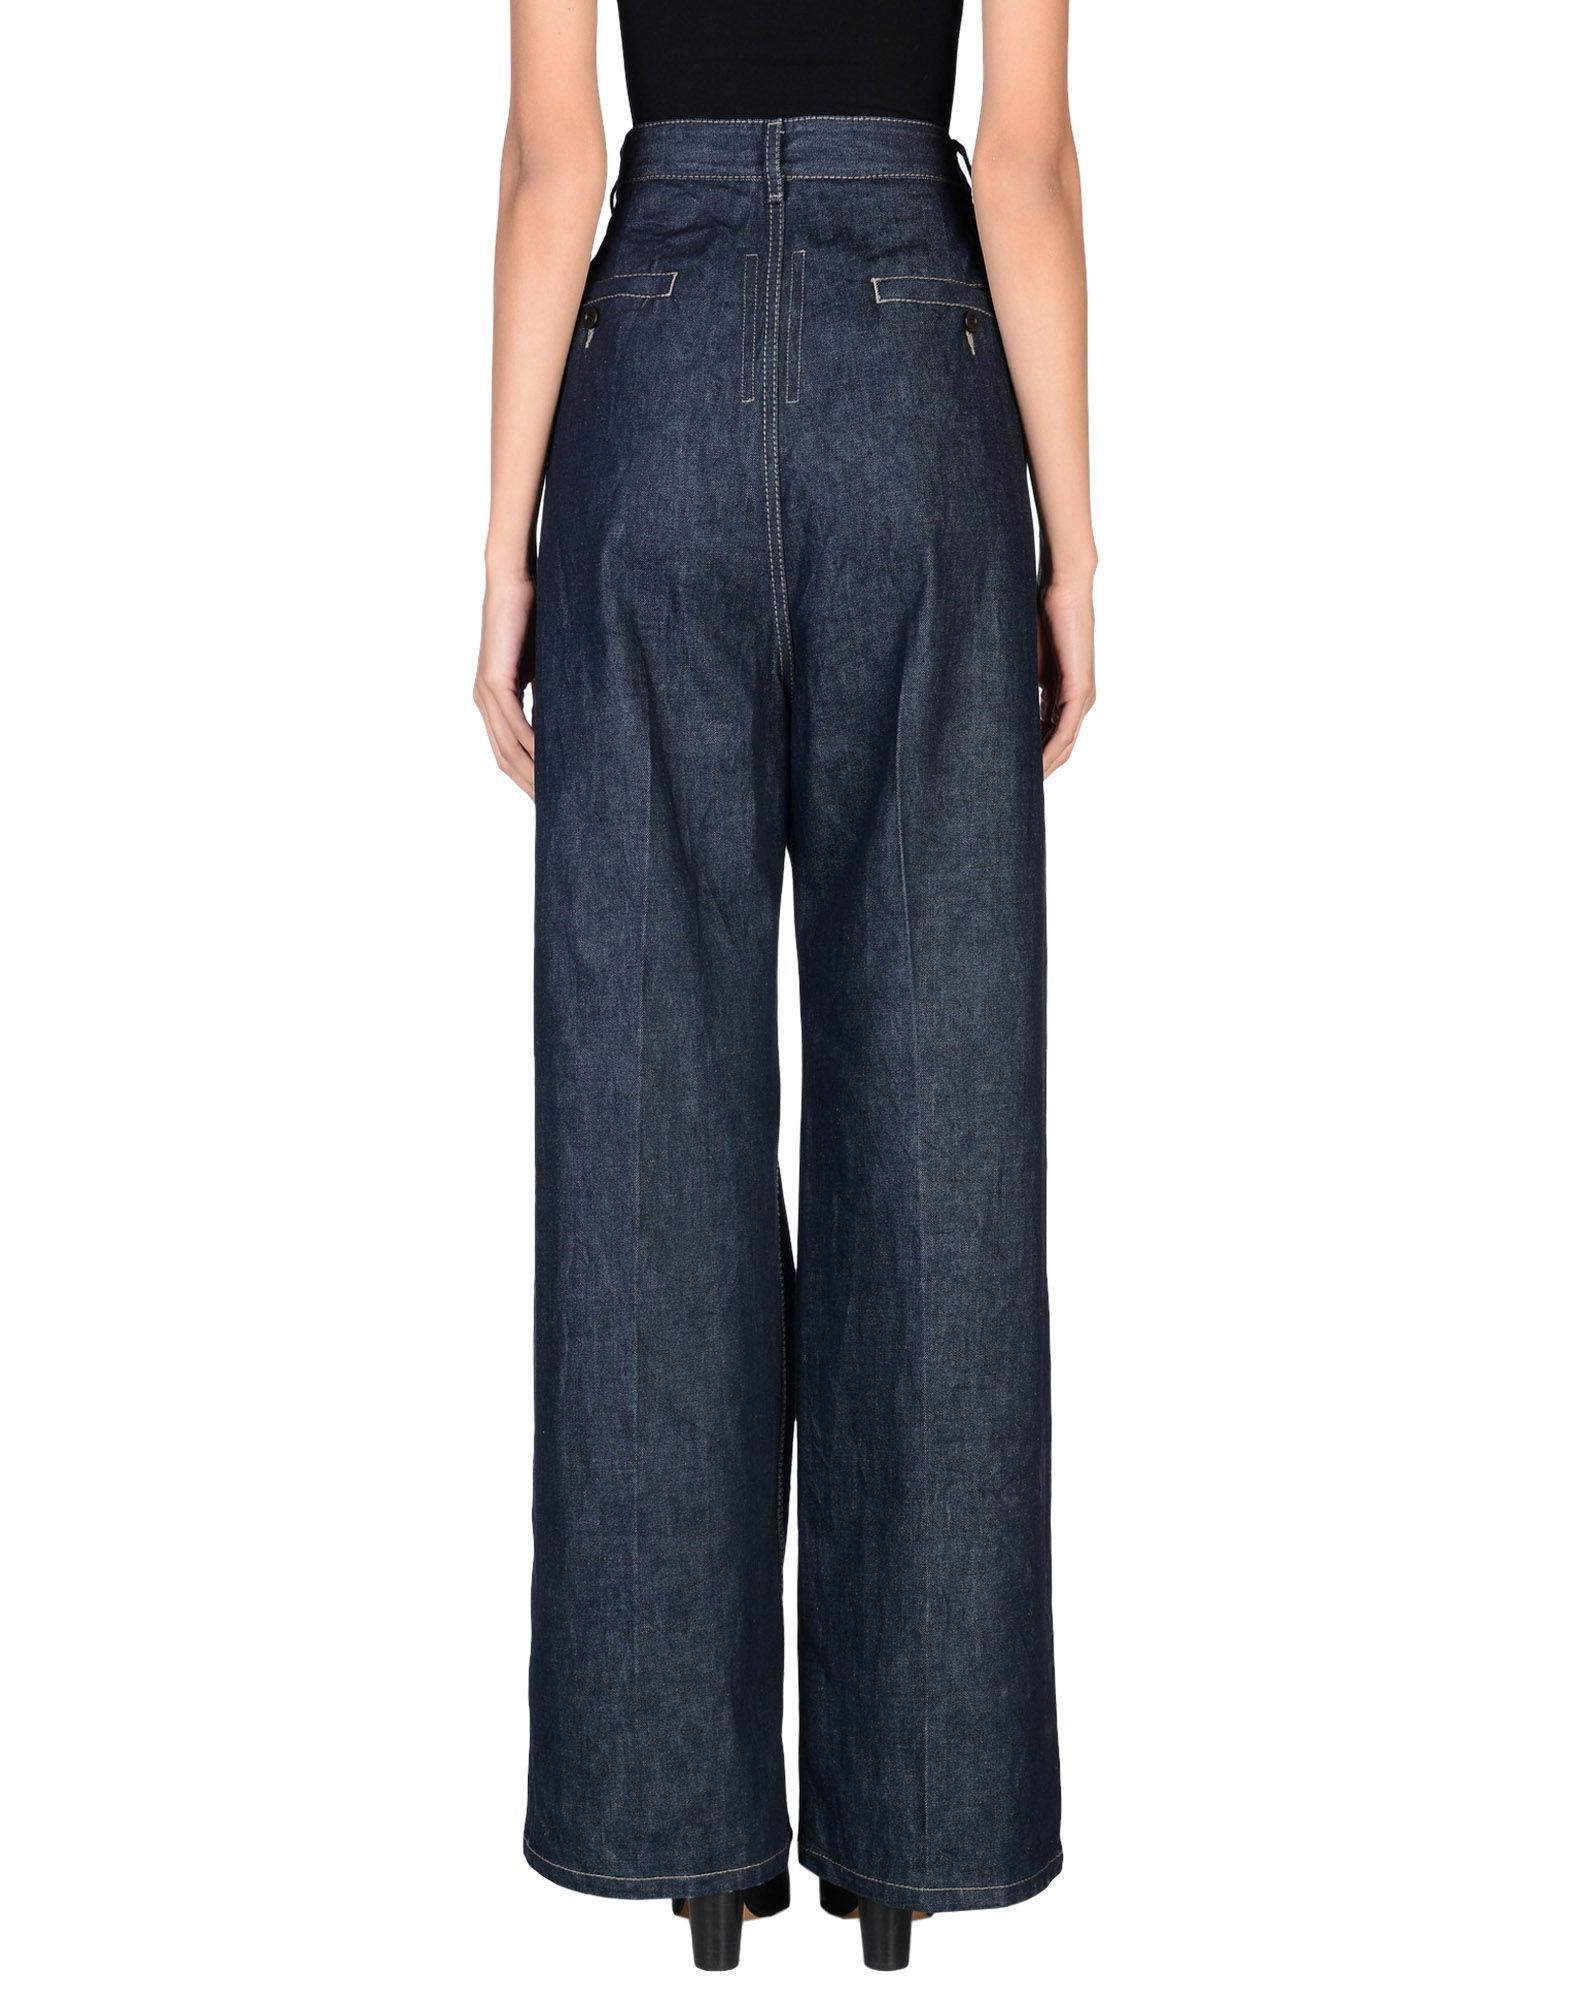 Drkshdw By Rick Owens Blue Cotton Jeans